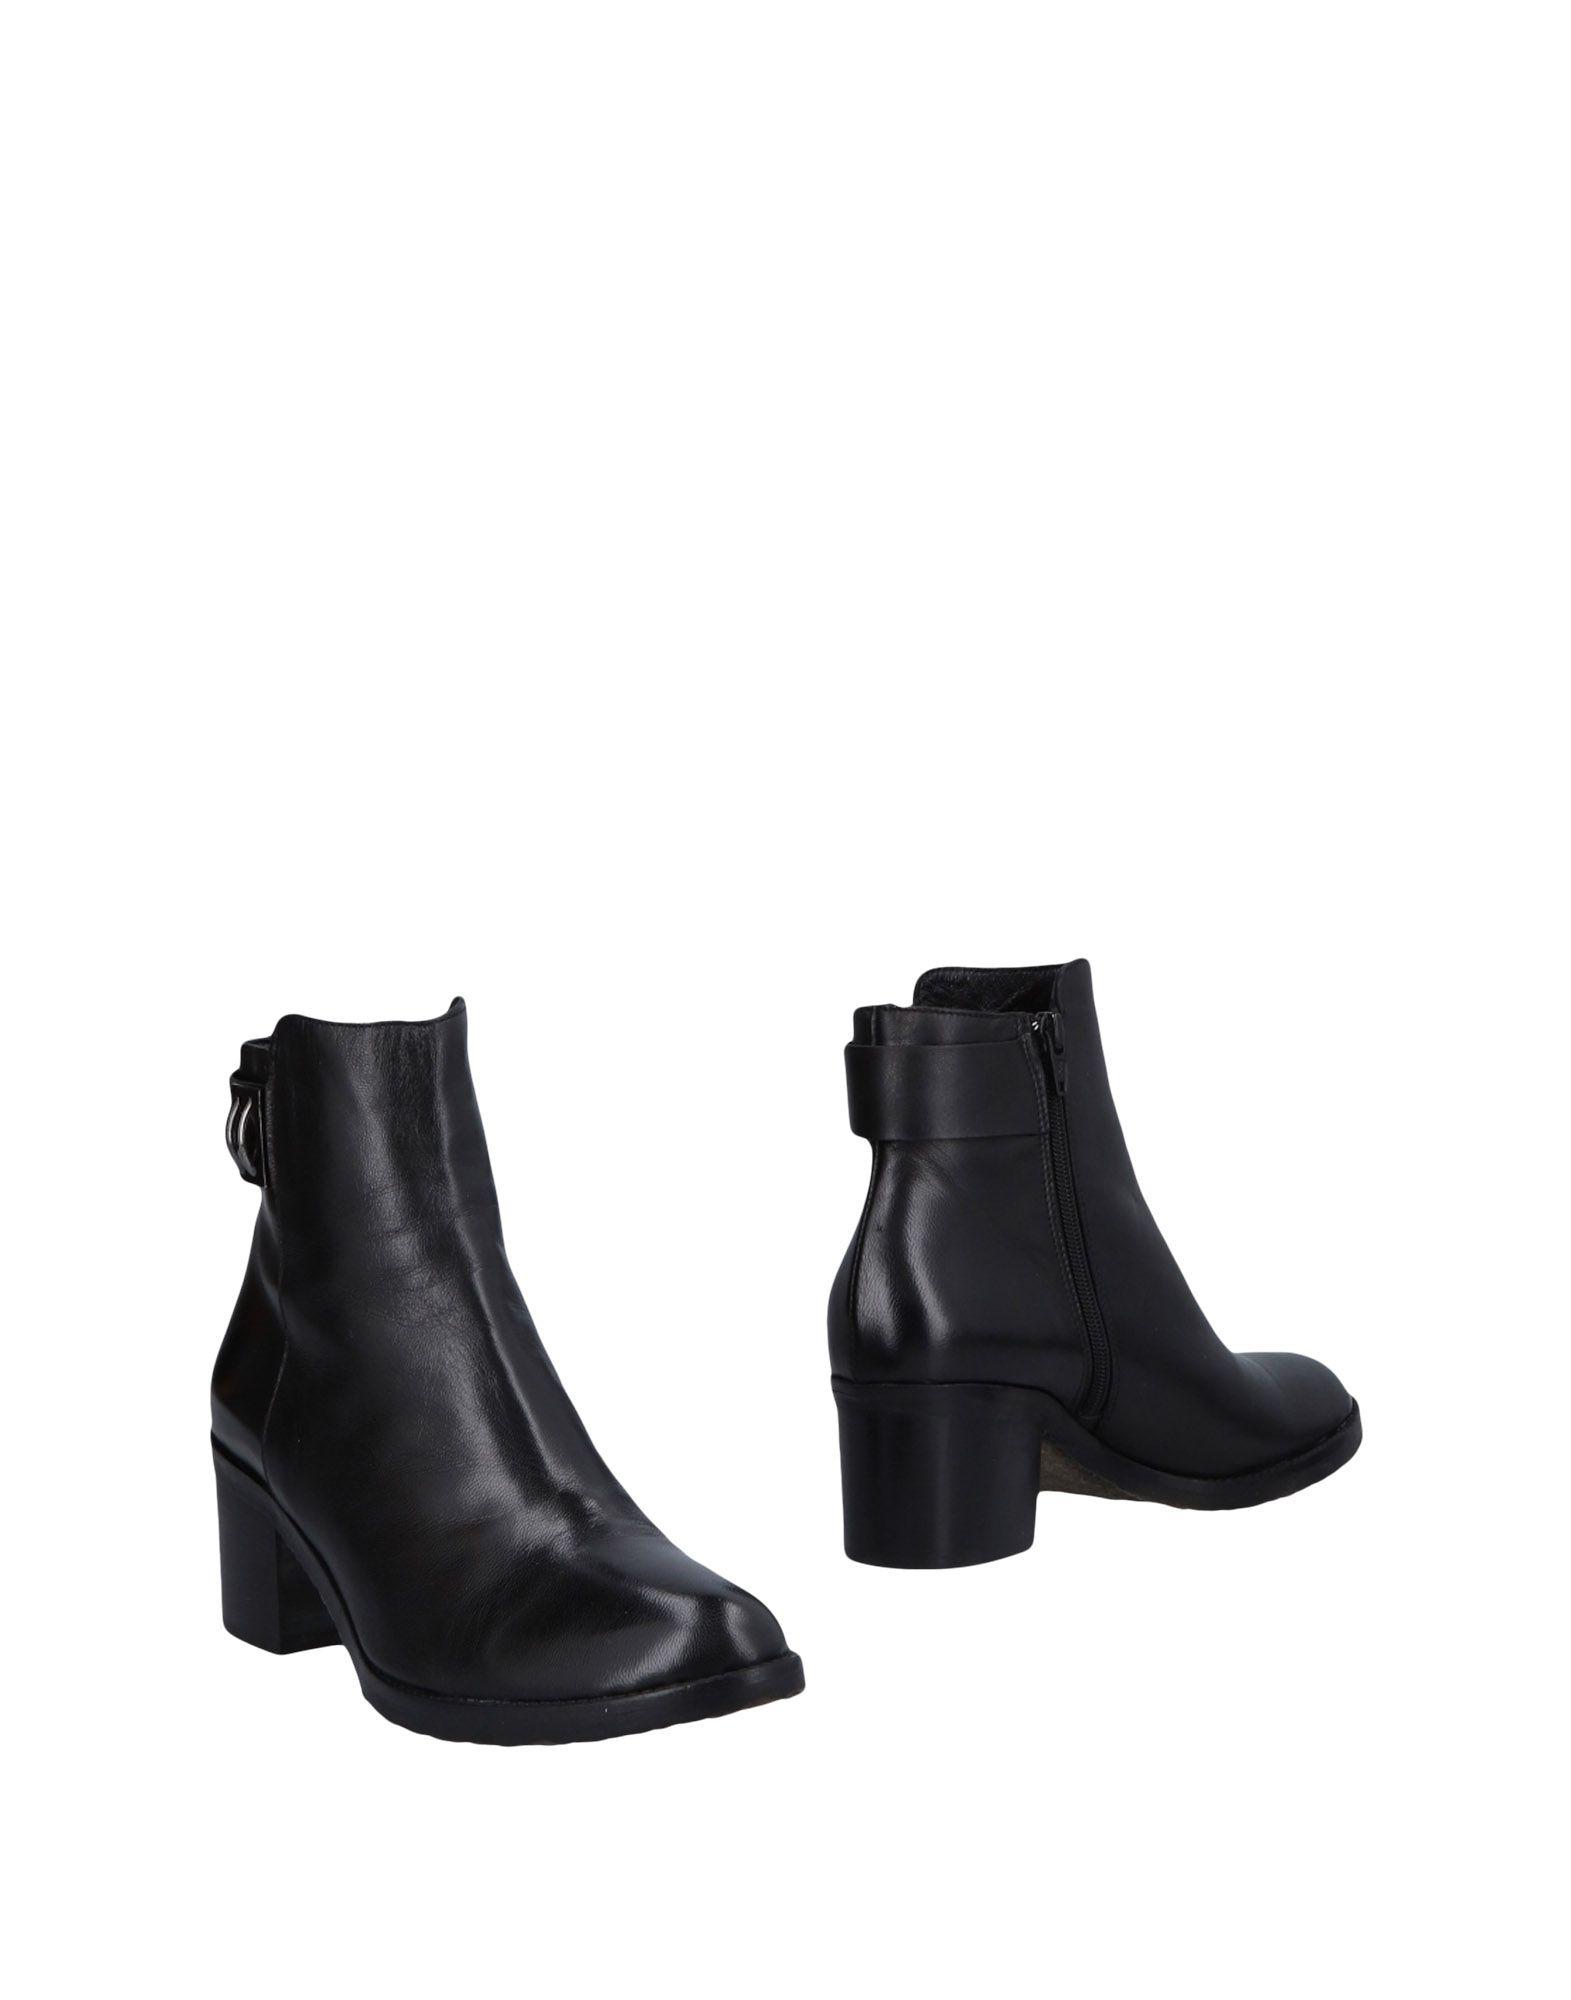 Ubi Major Ubi Ankle Boot - Women Ubi Major Major Ankle Boots online on  Australia - 11467400XM faa71a